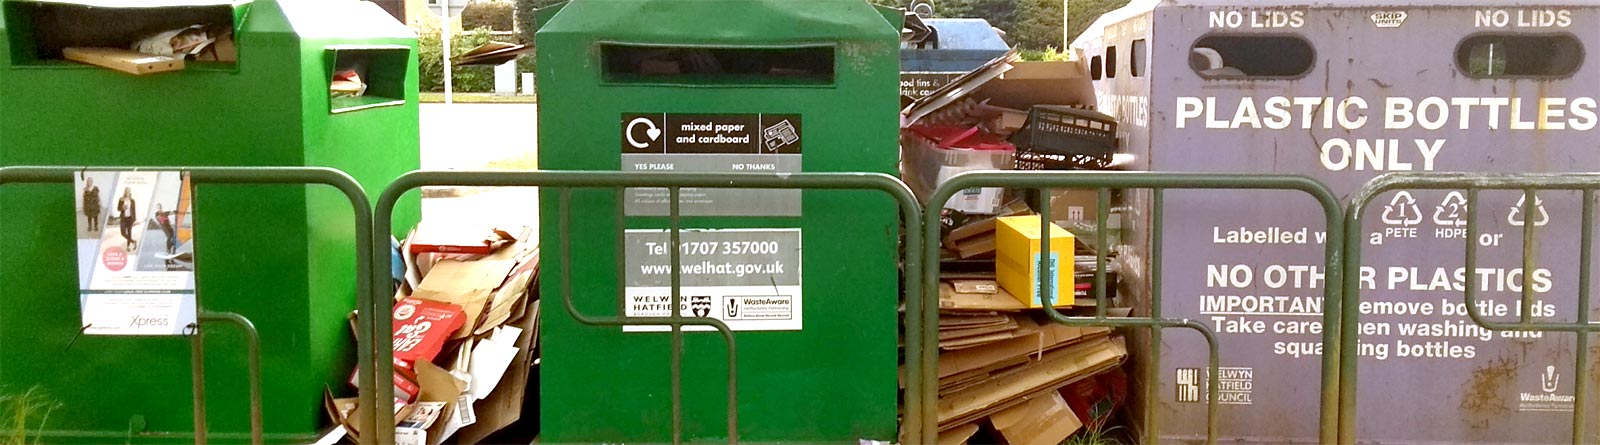 Stop the cardboard sprawl